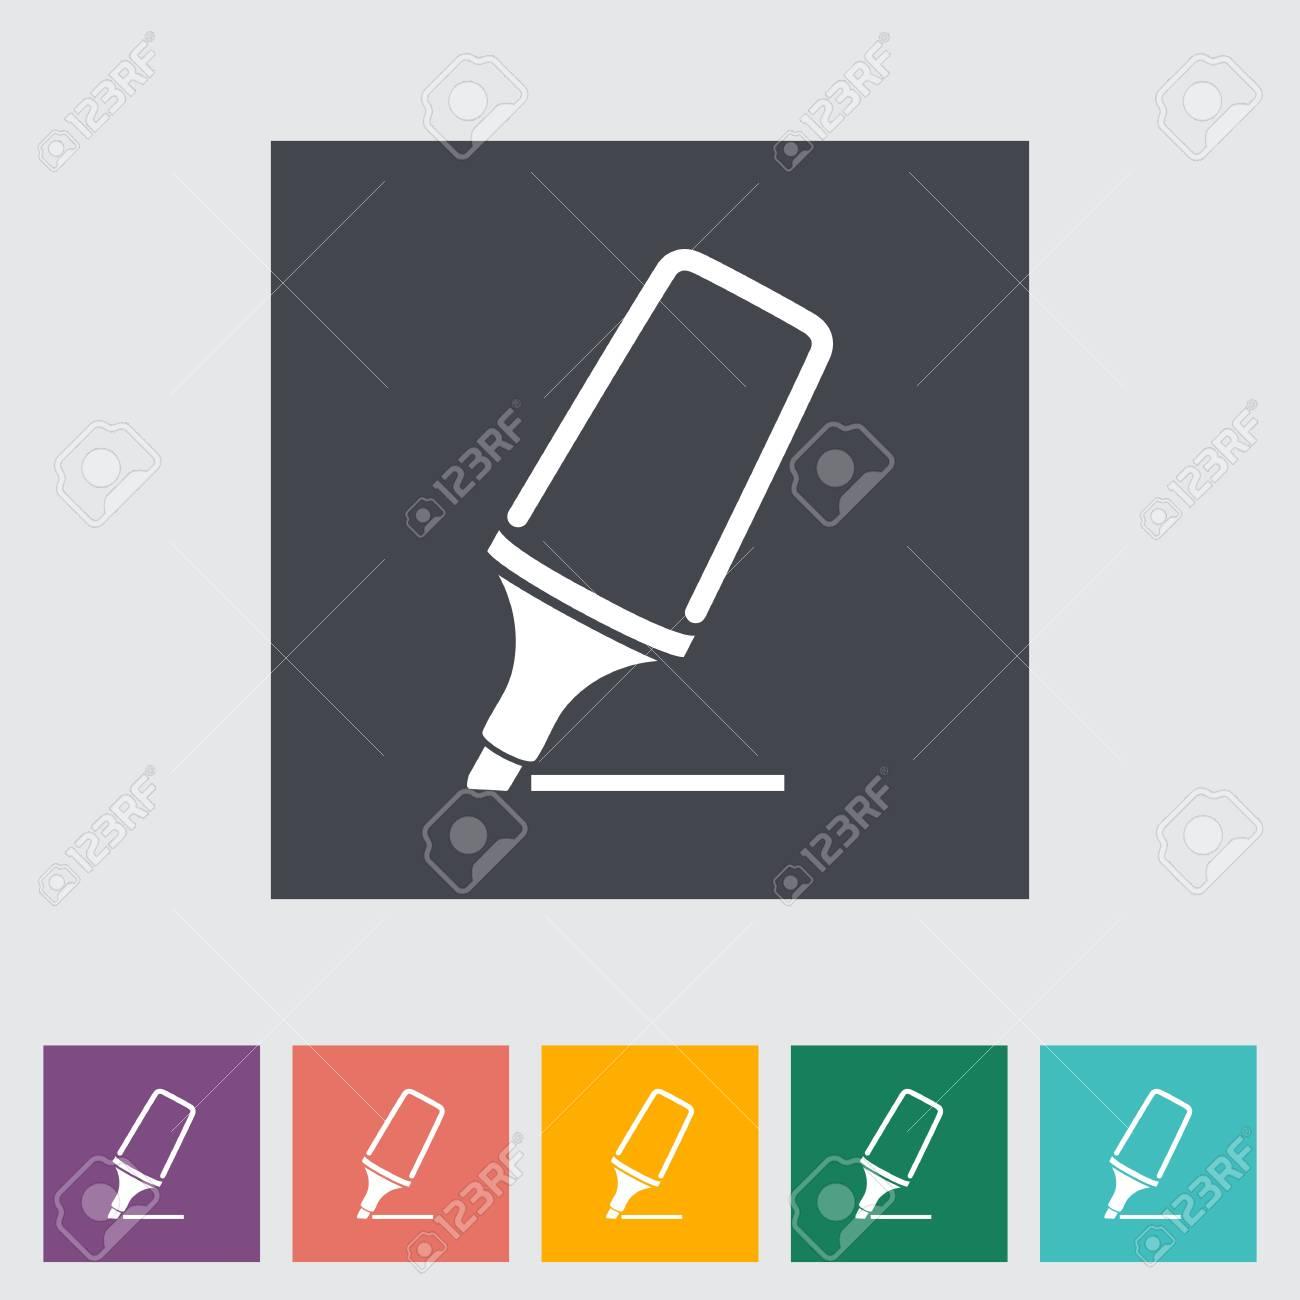 Marker. Single flat icon. Stock Vector - 21686732